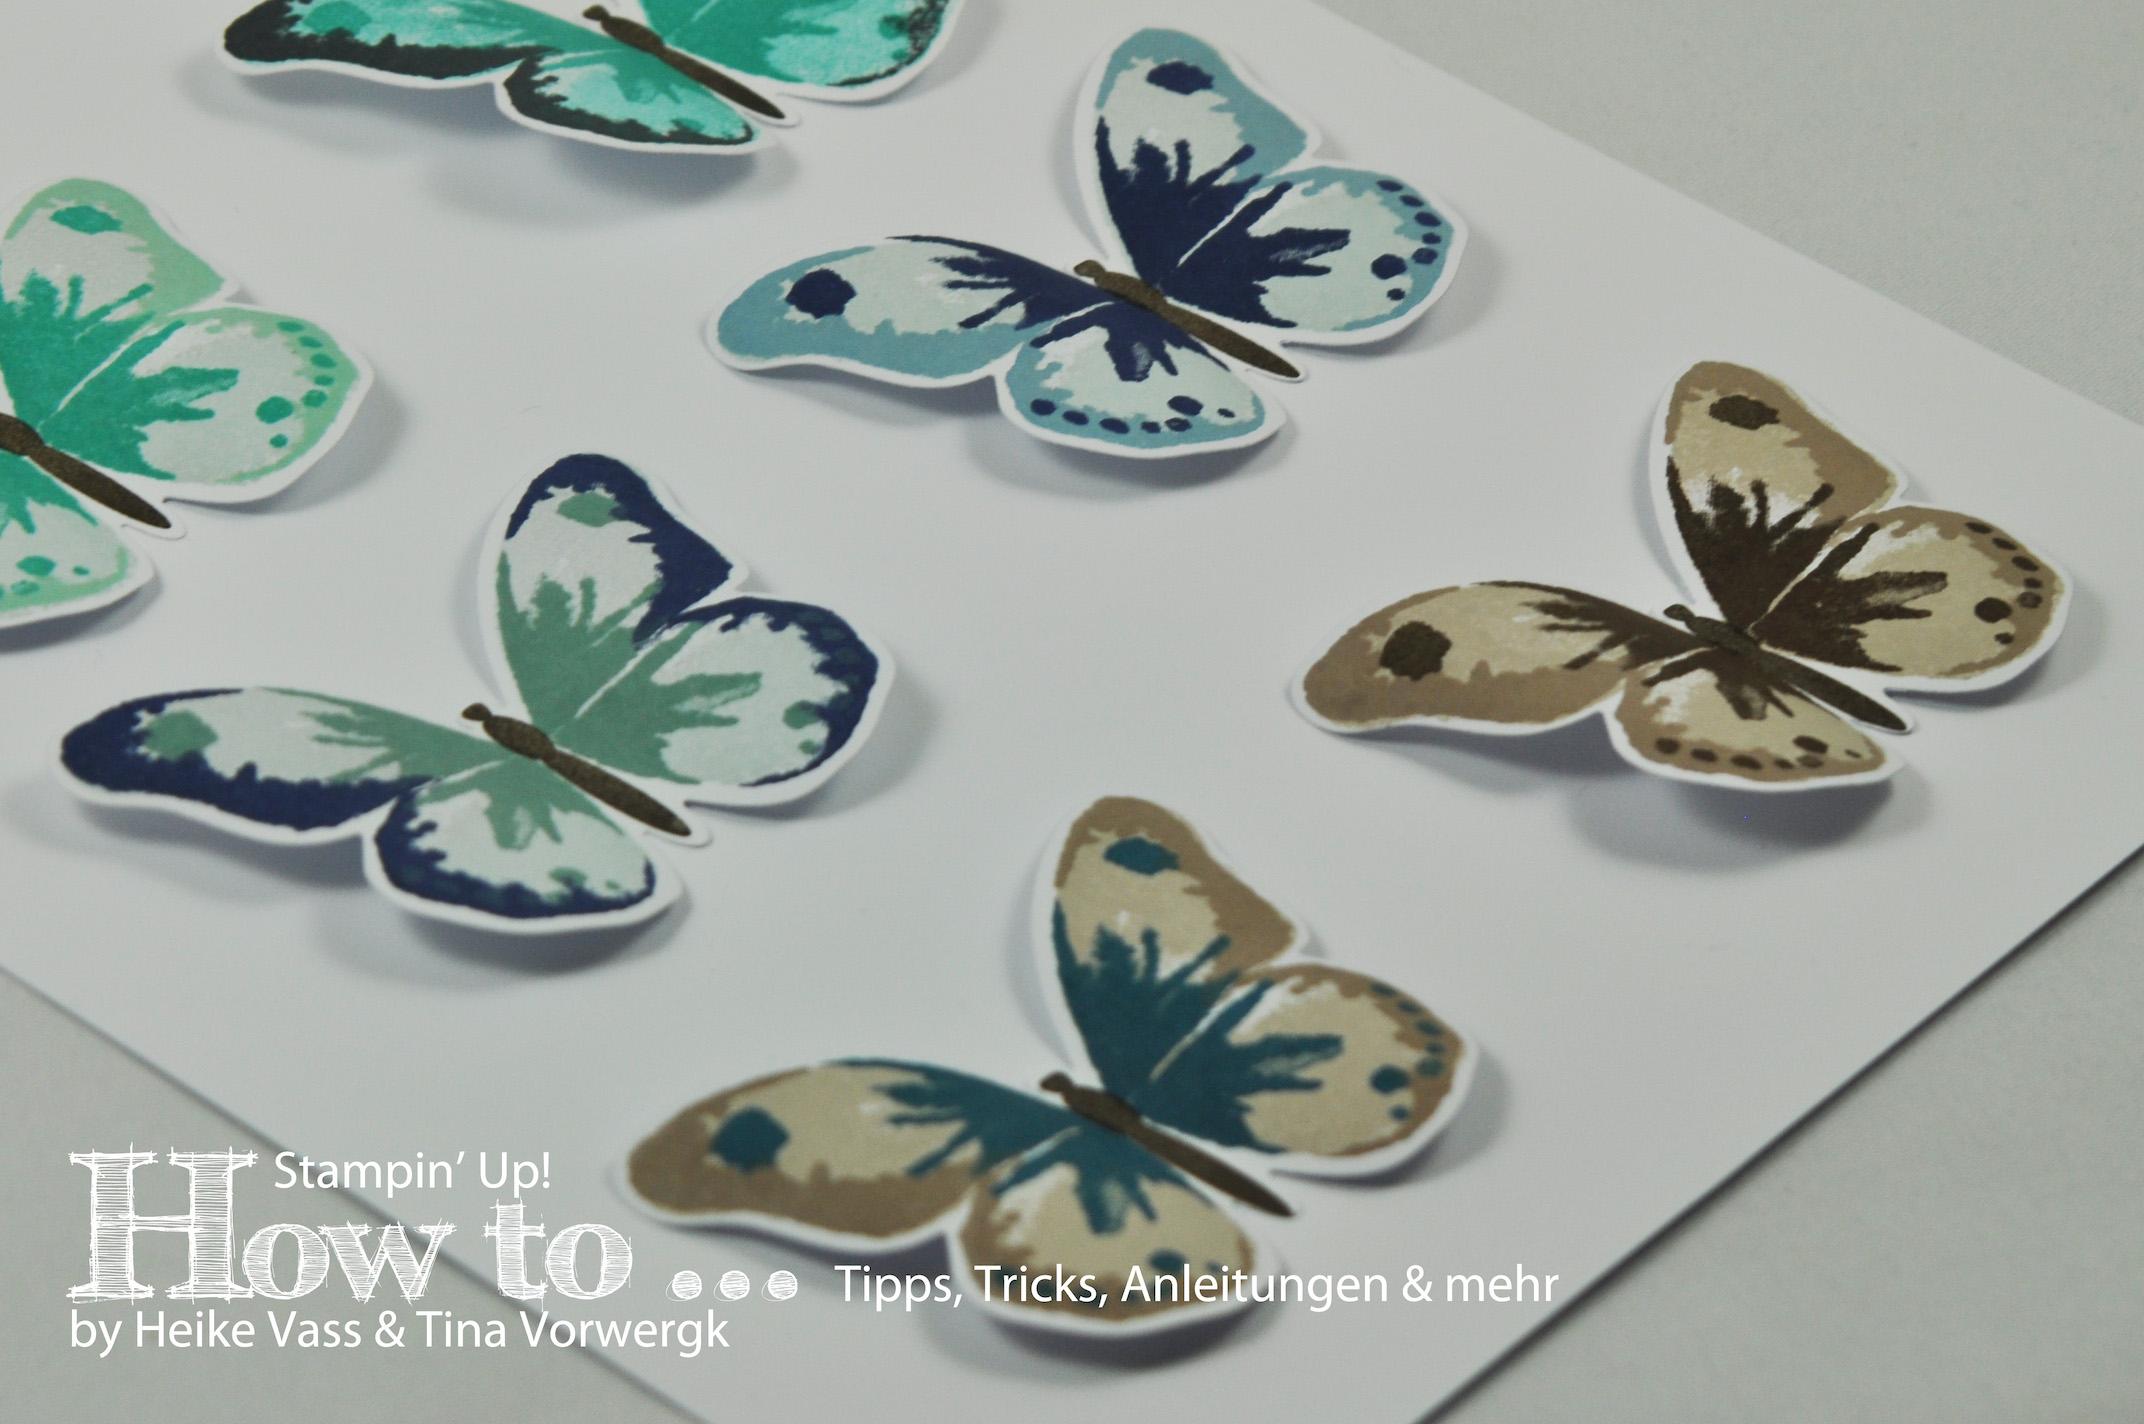 How to… Watercolor Wings Farbkombinationen